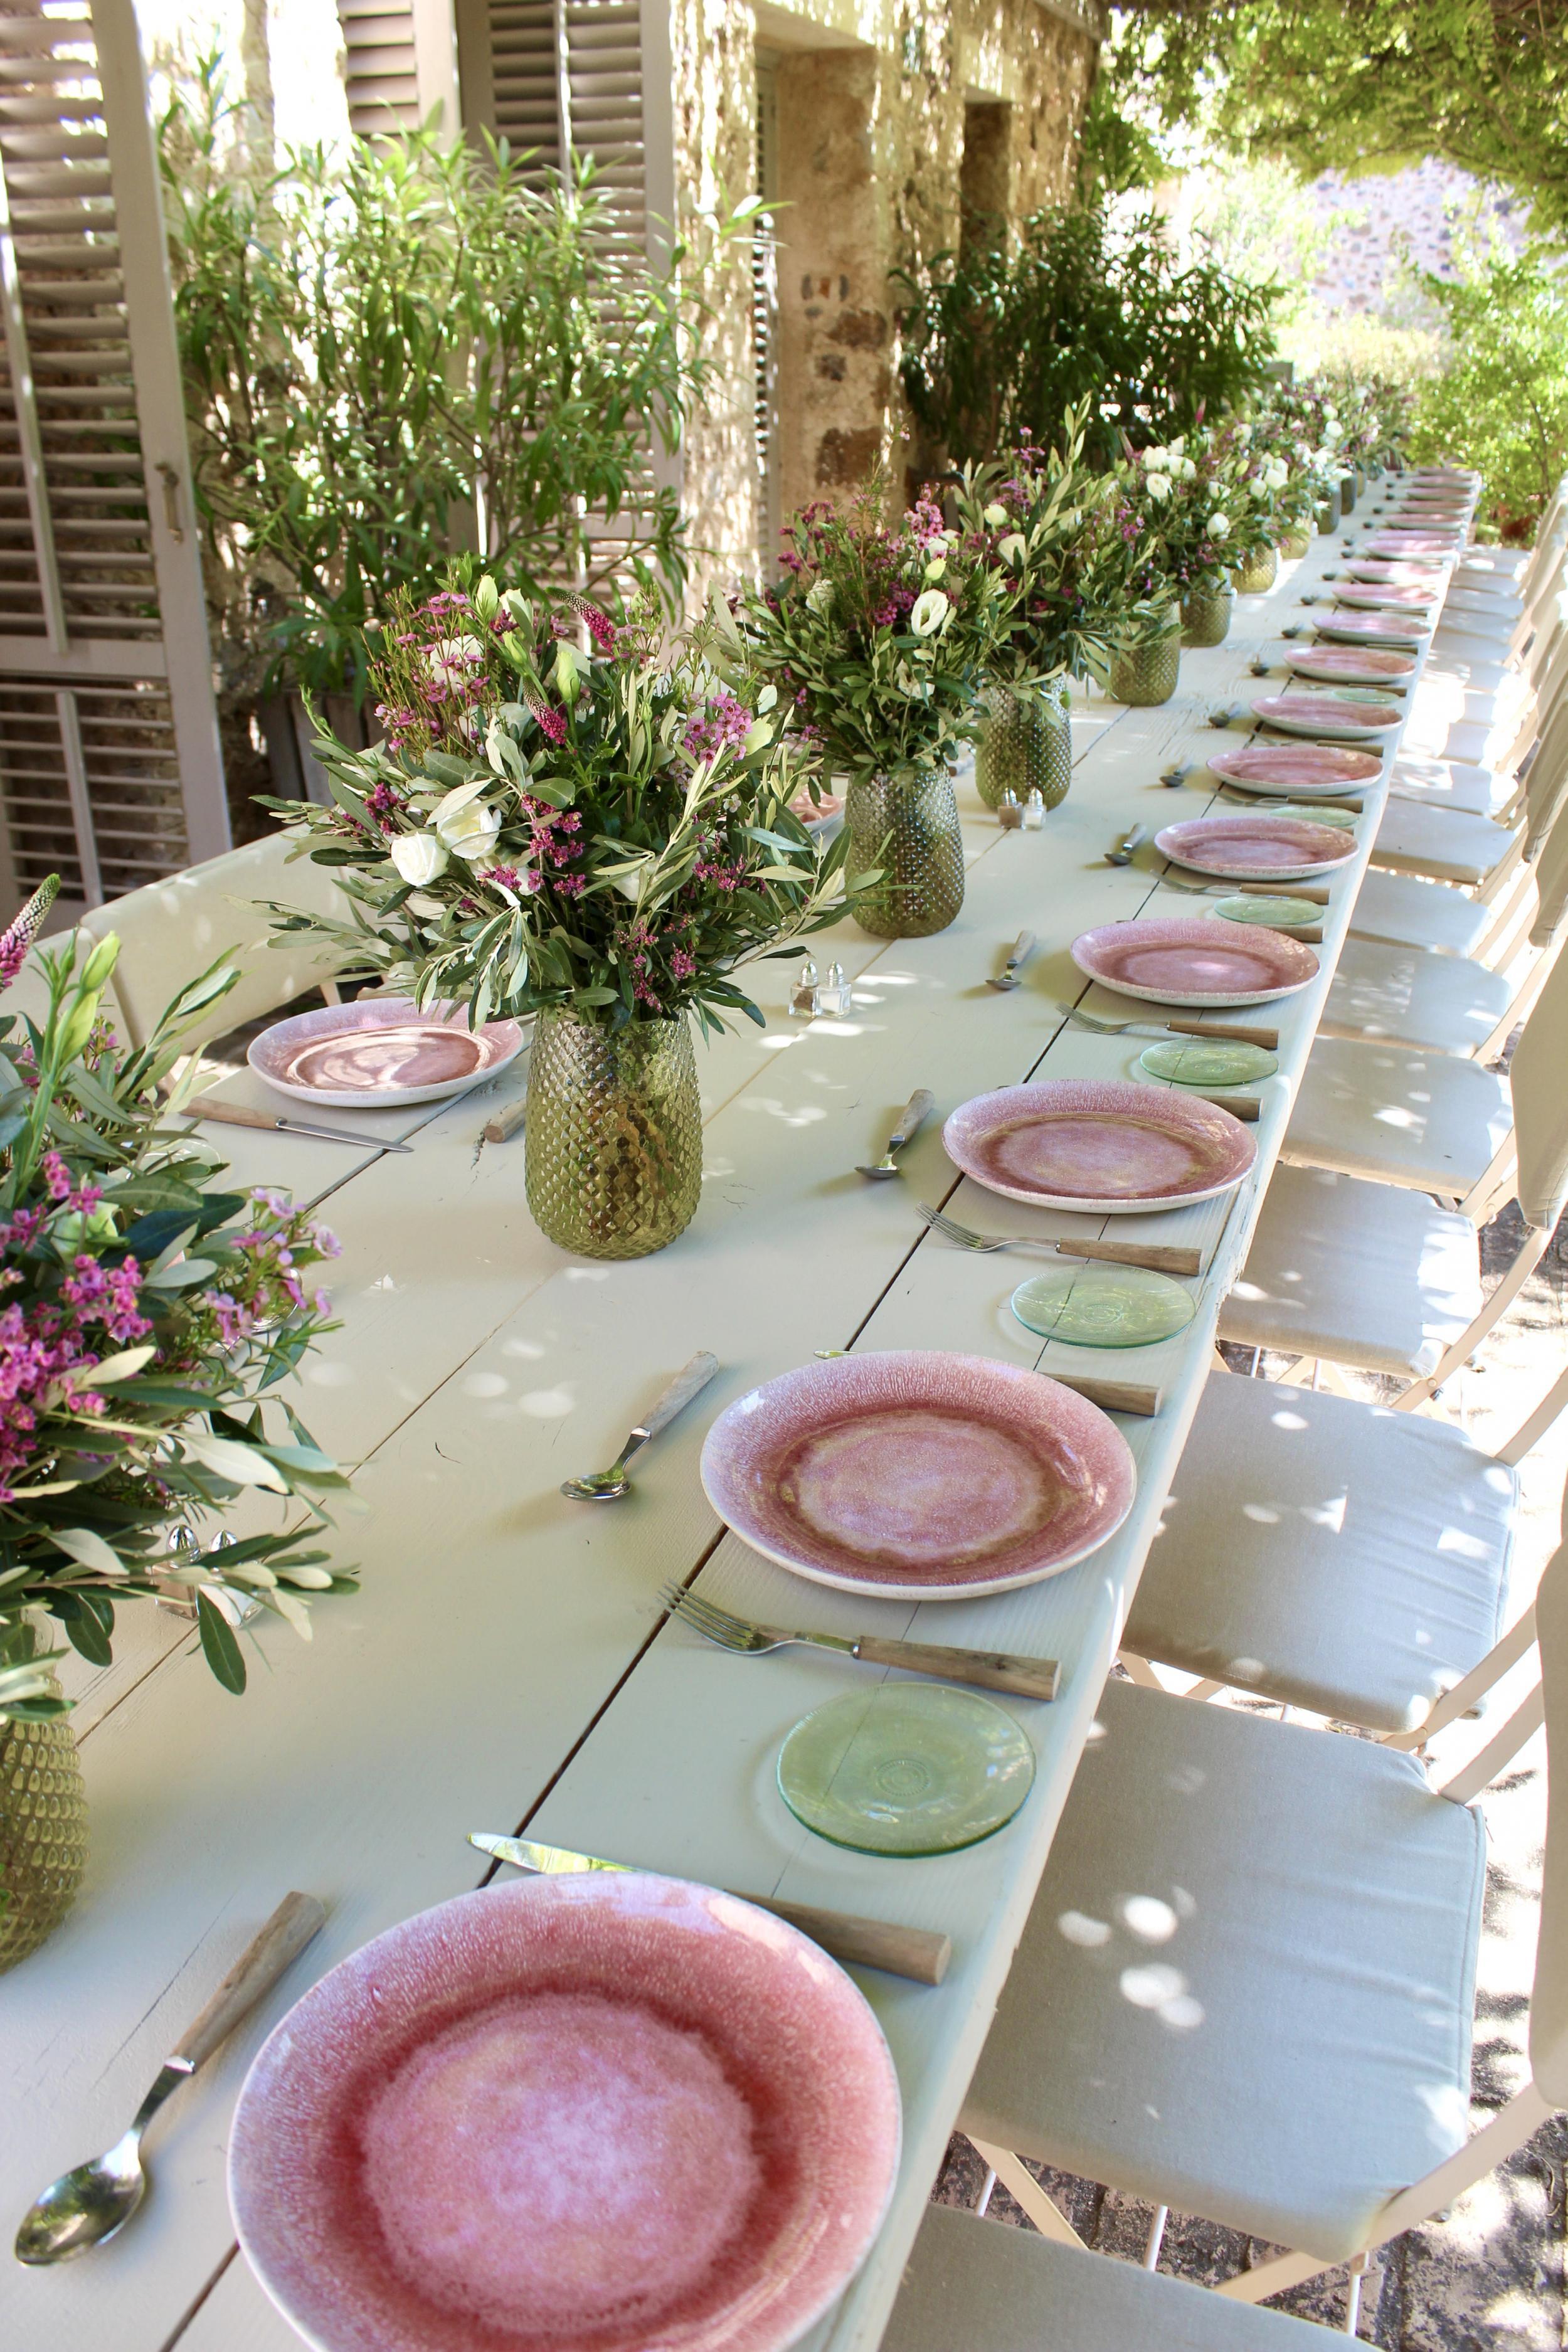 Pink plate set - Image 2